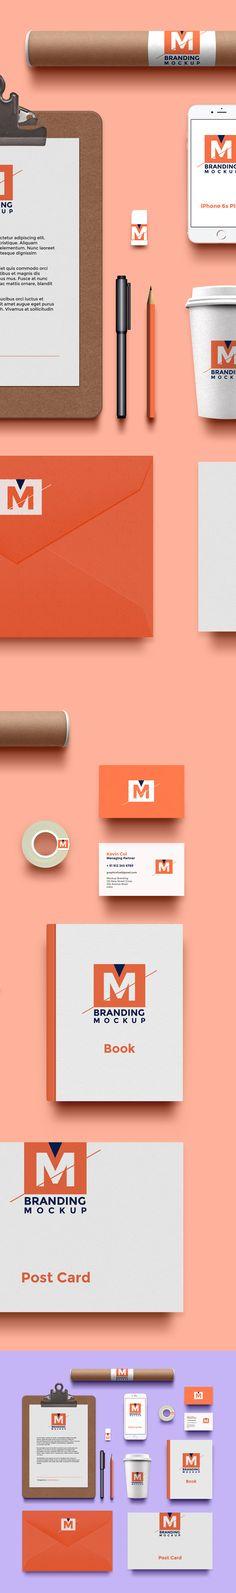 Free Branding Identity Mockup PSD (39.1 MB) | graphicsfuel.com | #free #photoshop #mockup